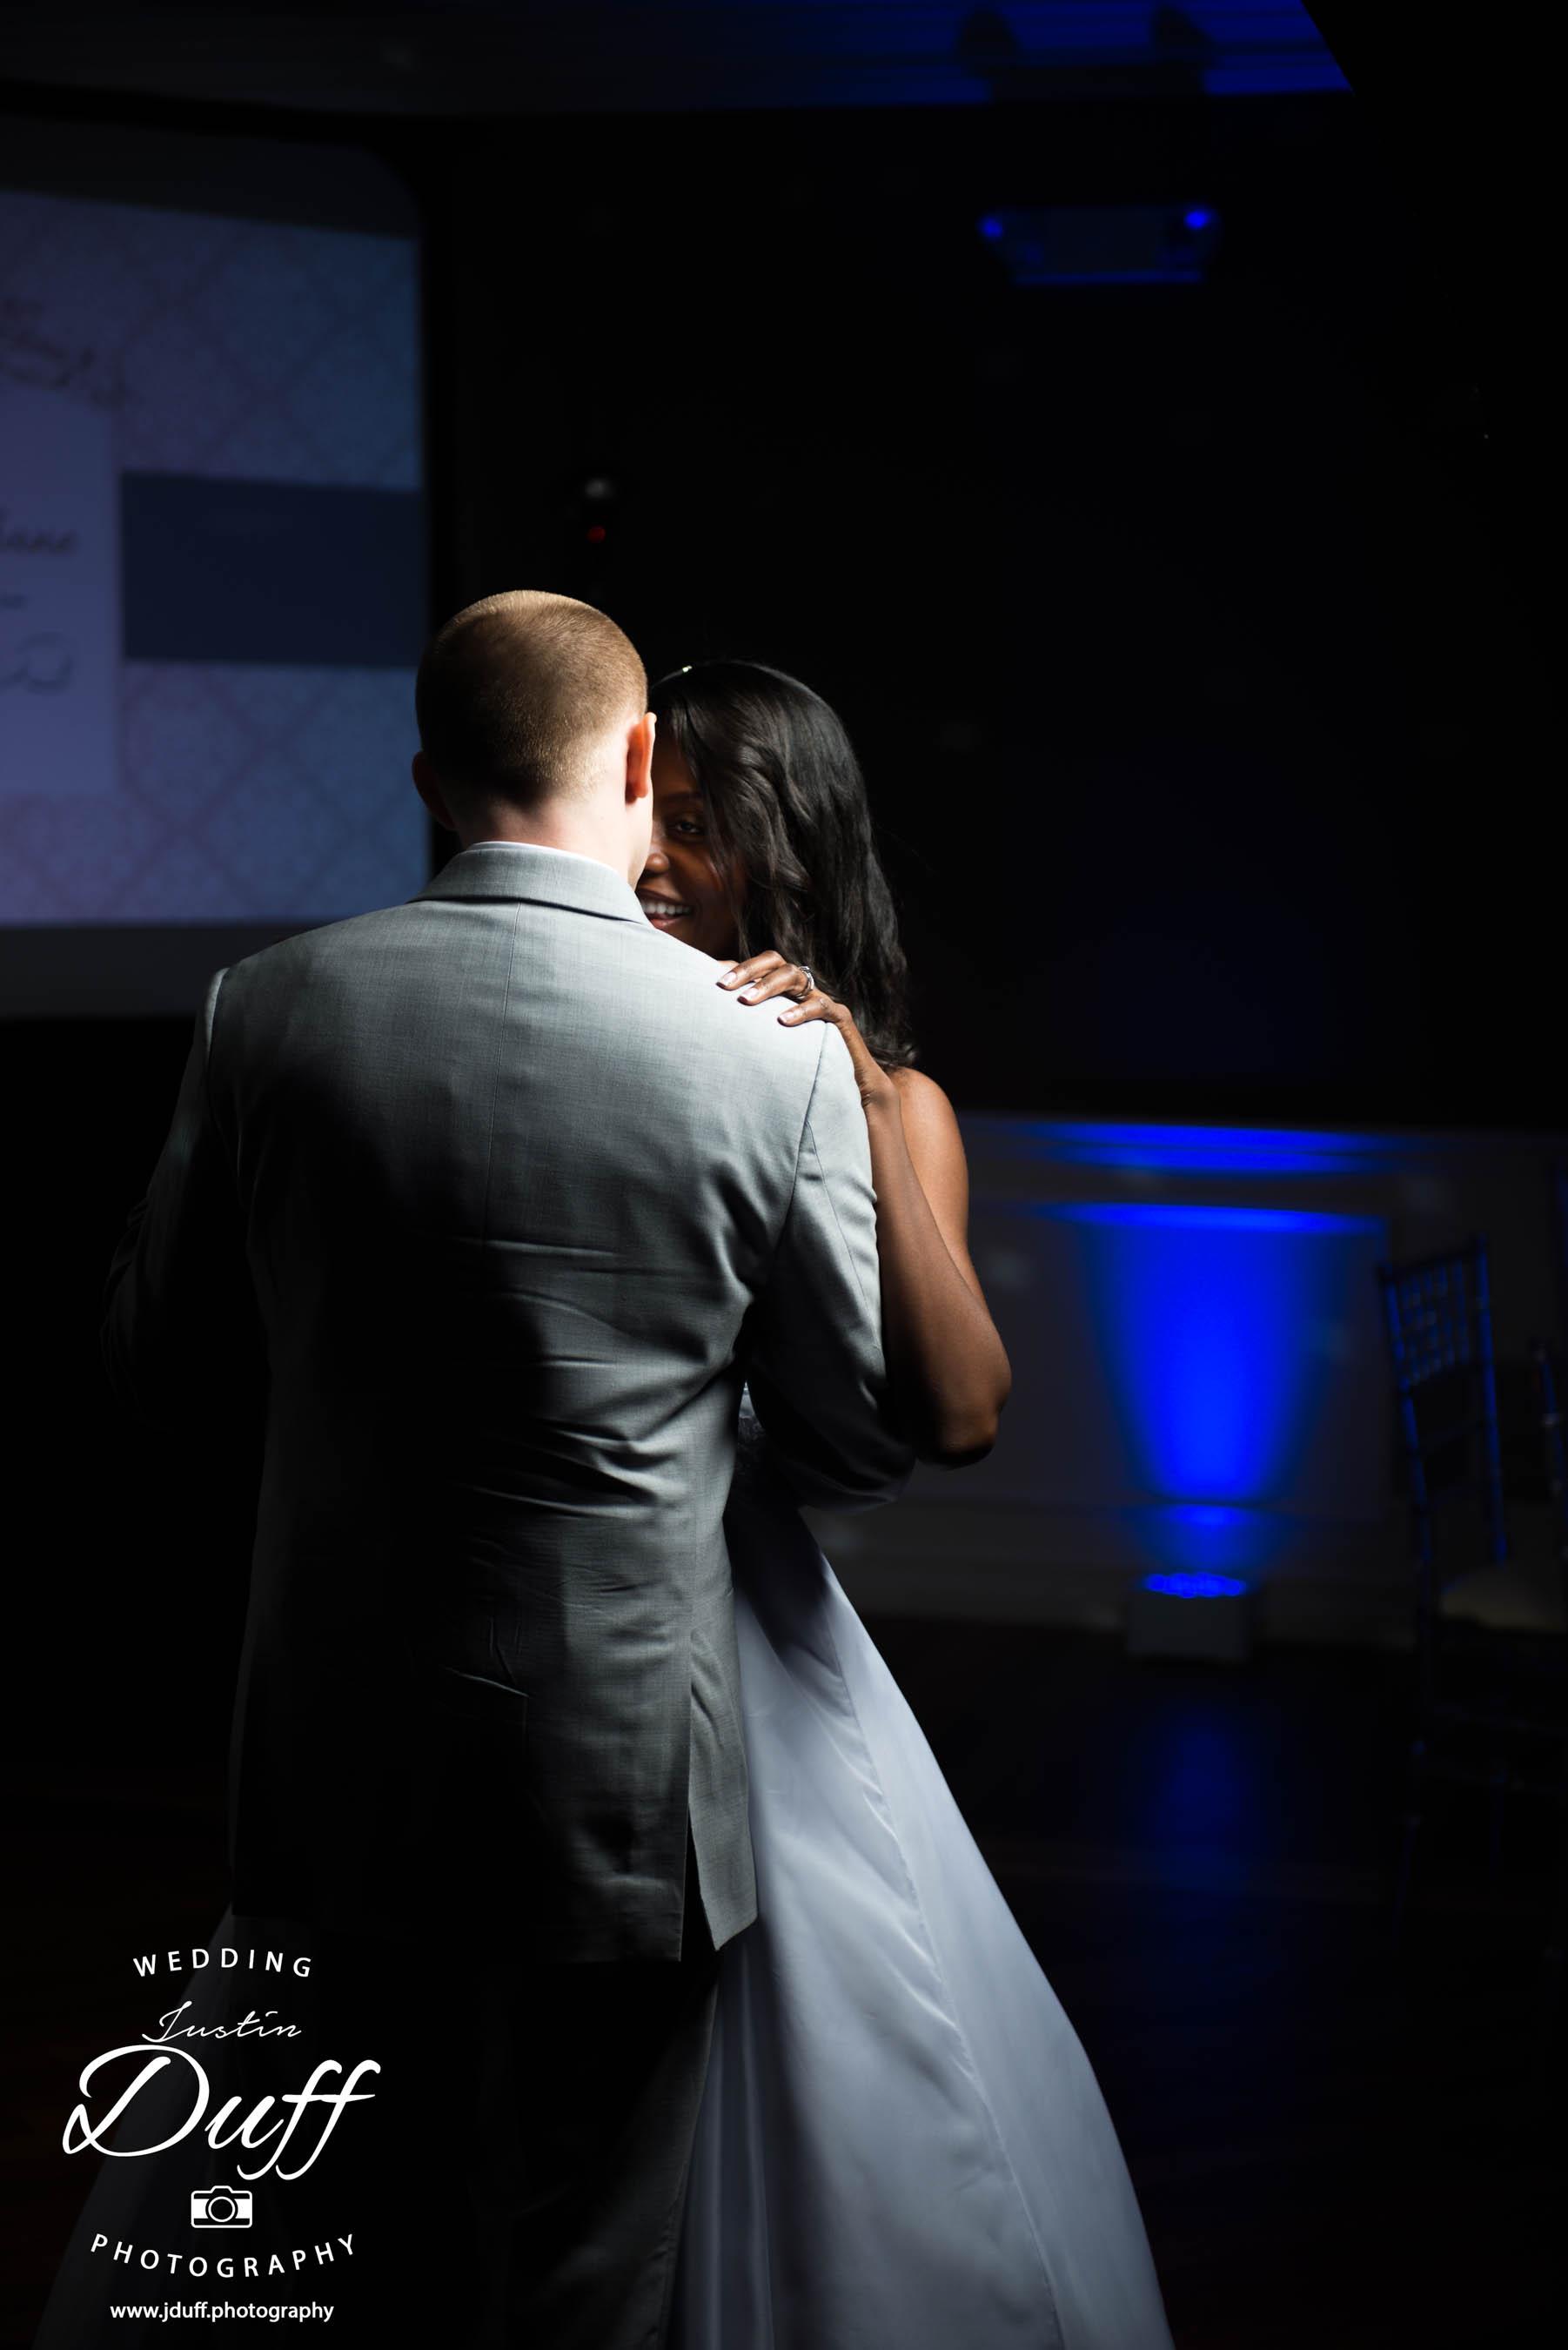 Fountains Golf Course Wedding - Royal Oak Photographer – Deanna & Shane Bride and groom first dance